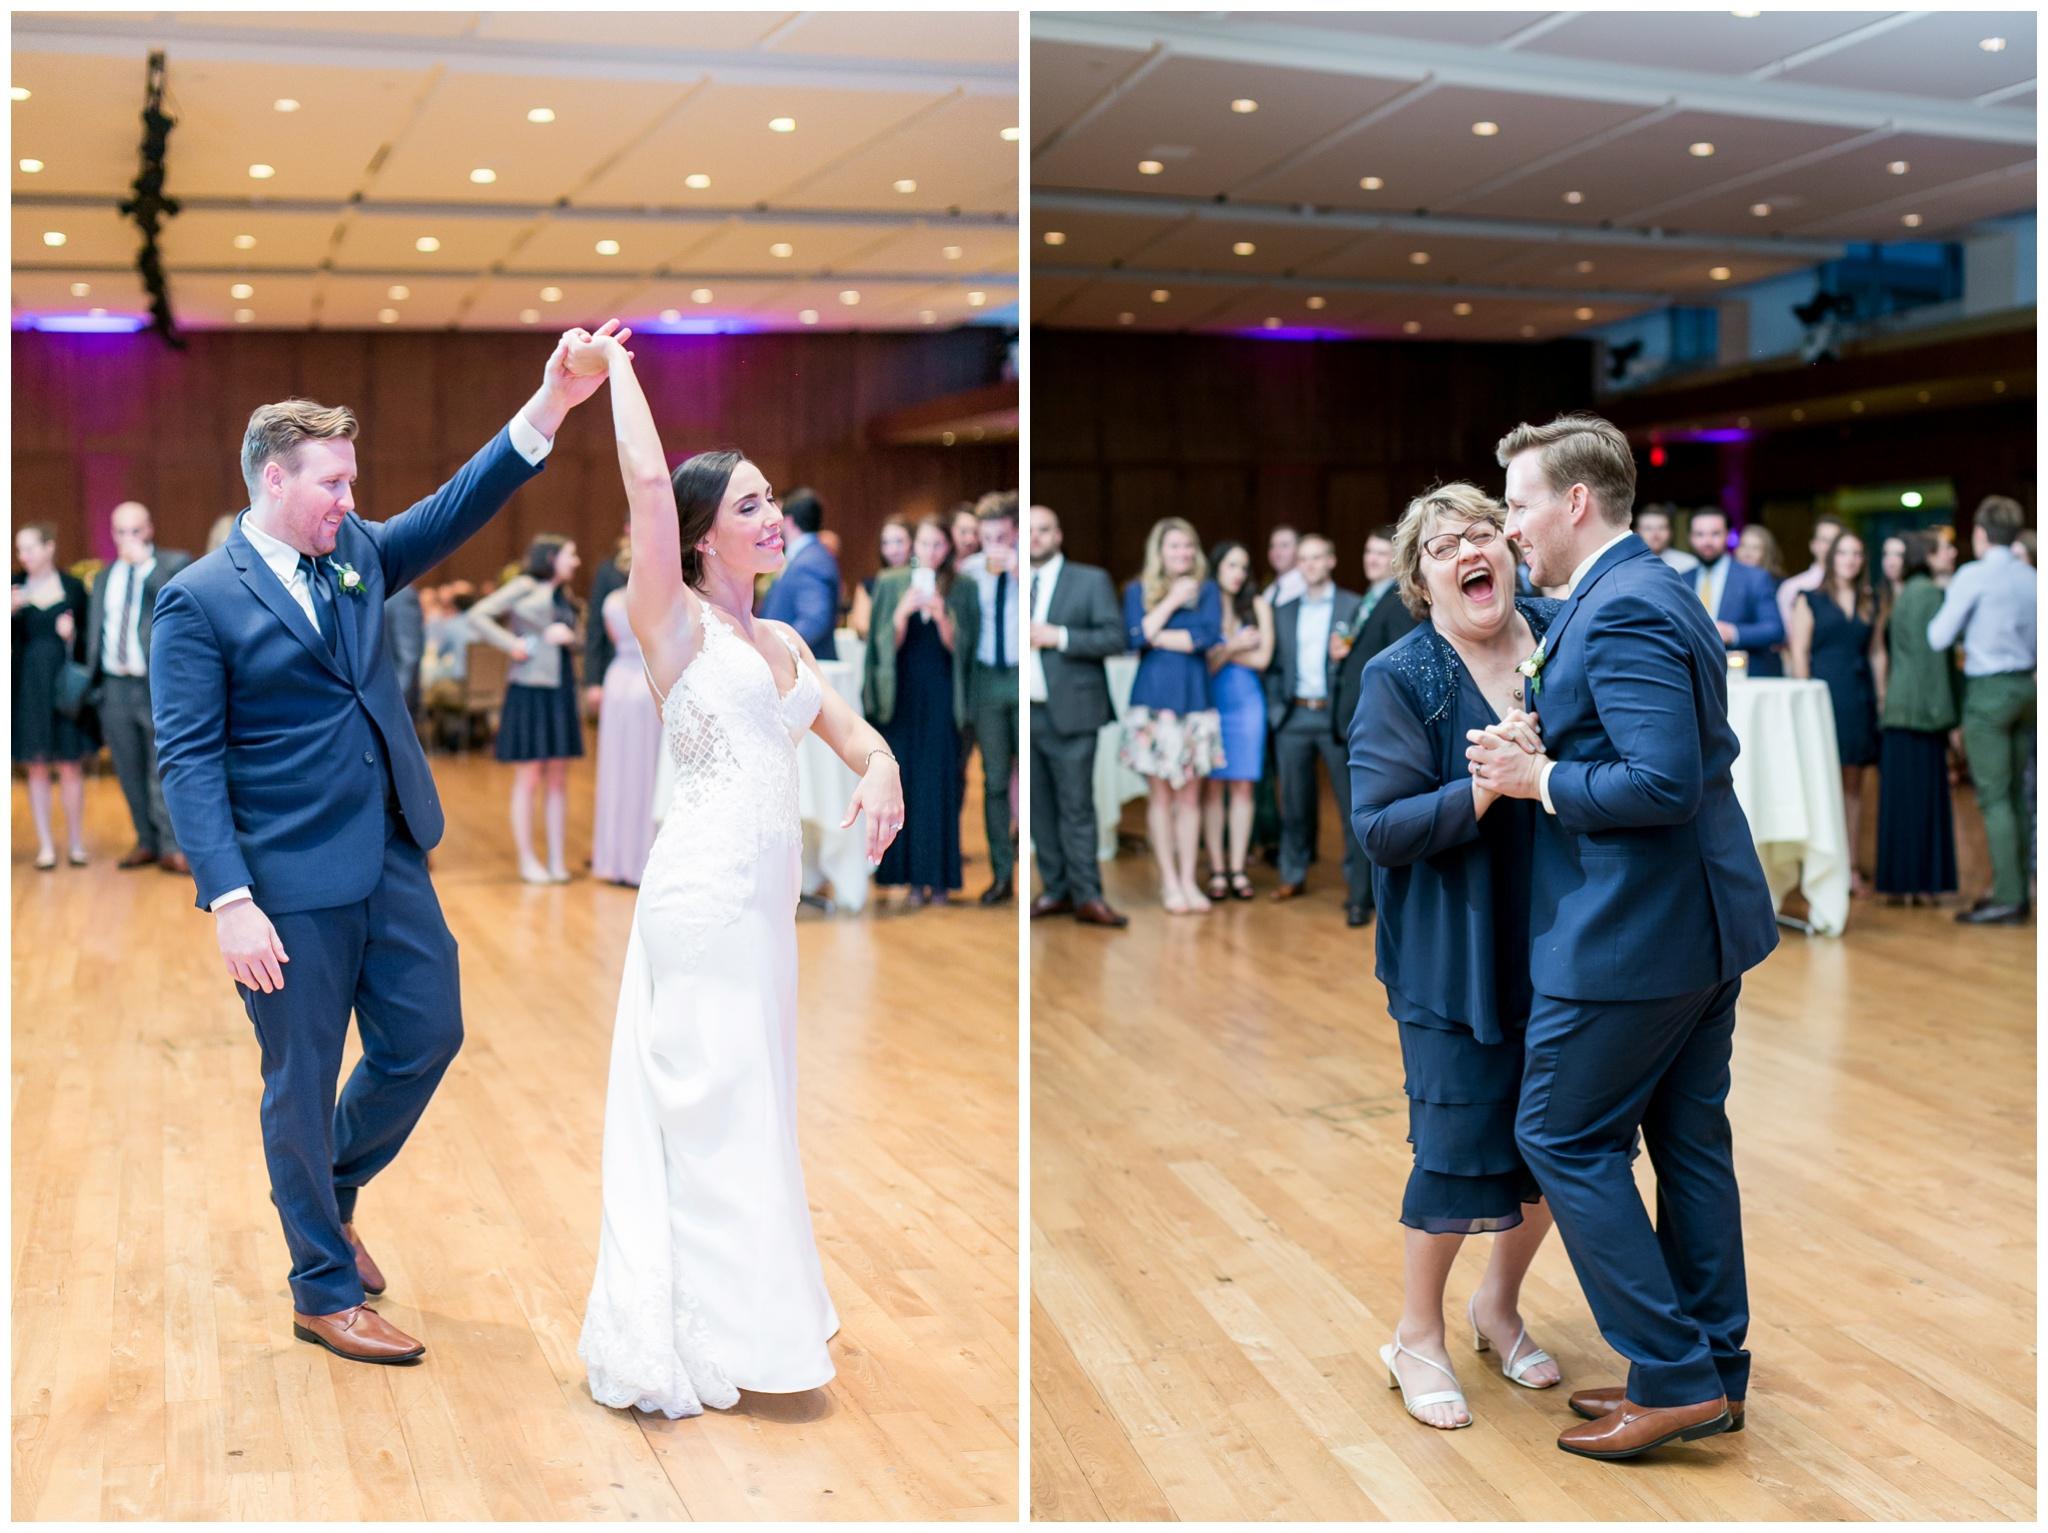 Union_south_Wedding_Madison_Wisconsin_Caynay_Photo_3694.jpg